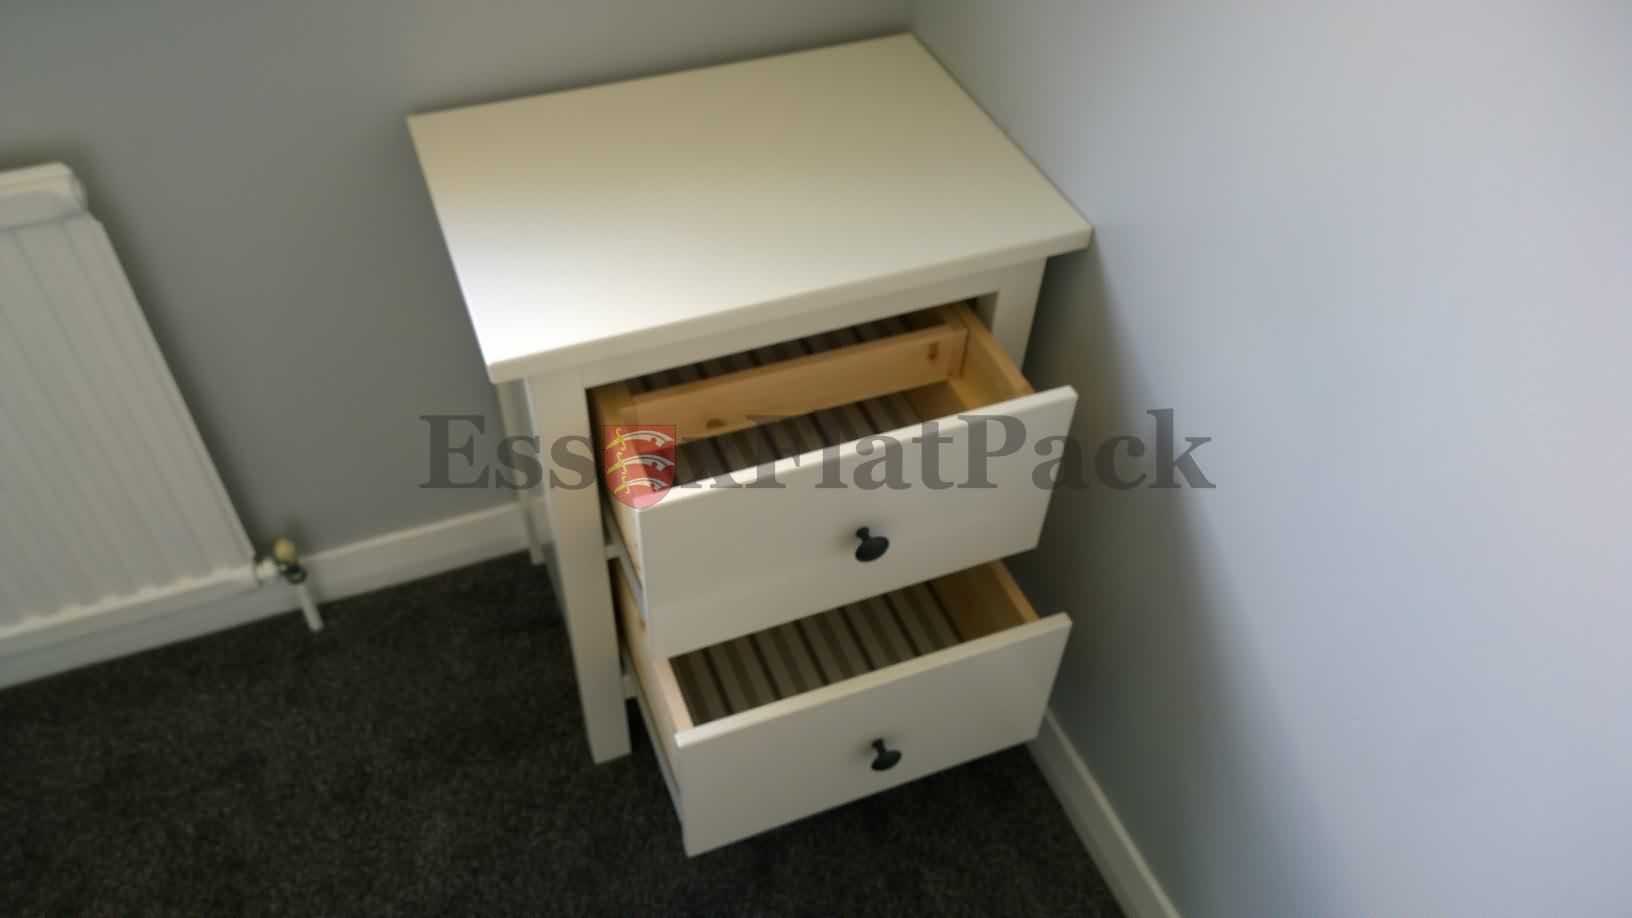 essexflatpack-furniture-20170710141747.jpg